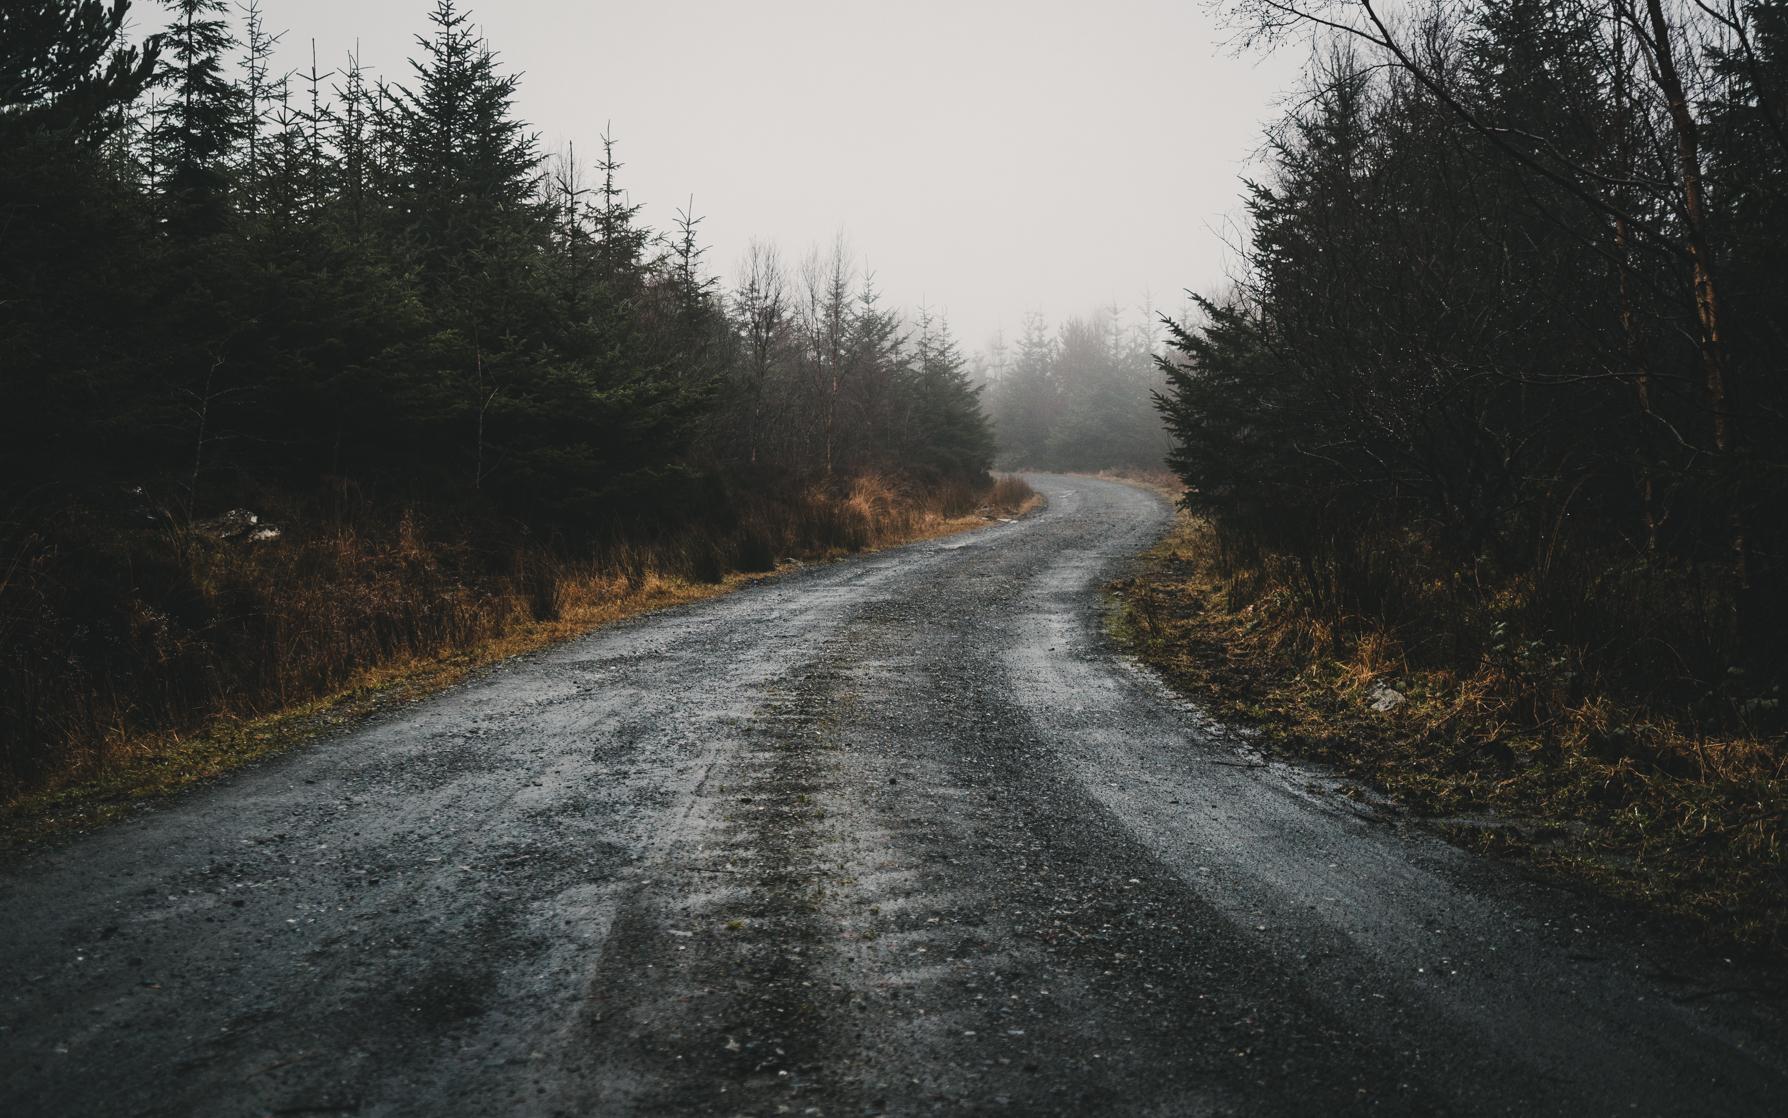 snowdonia_2-118.jpg